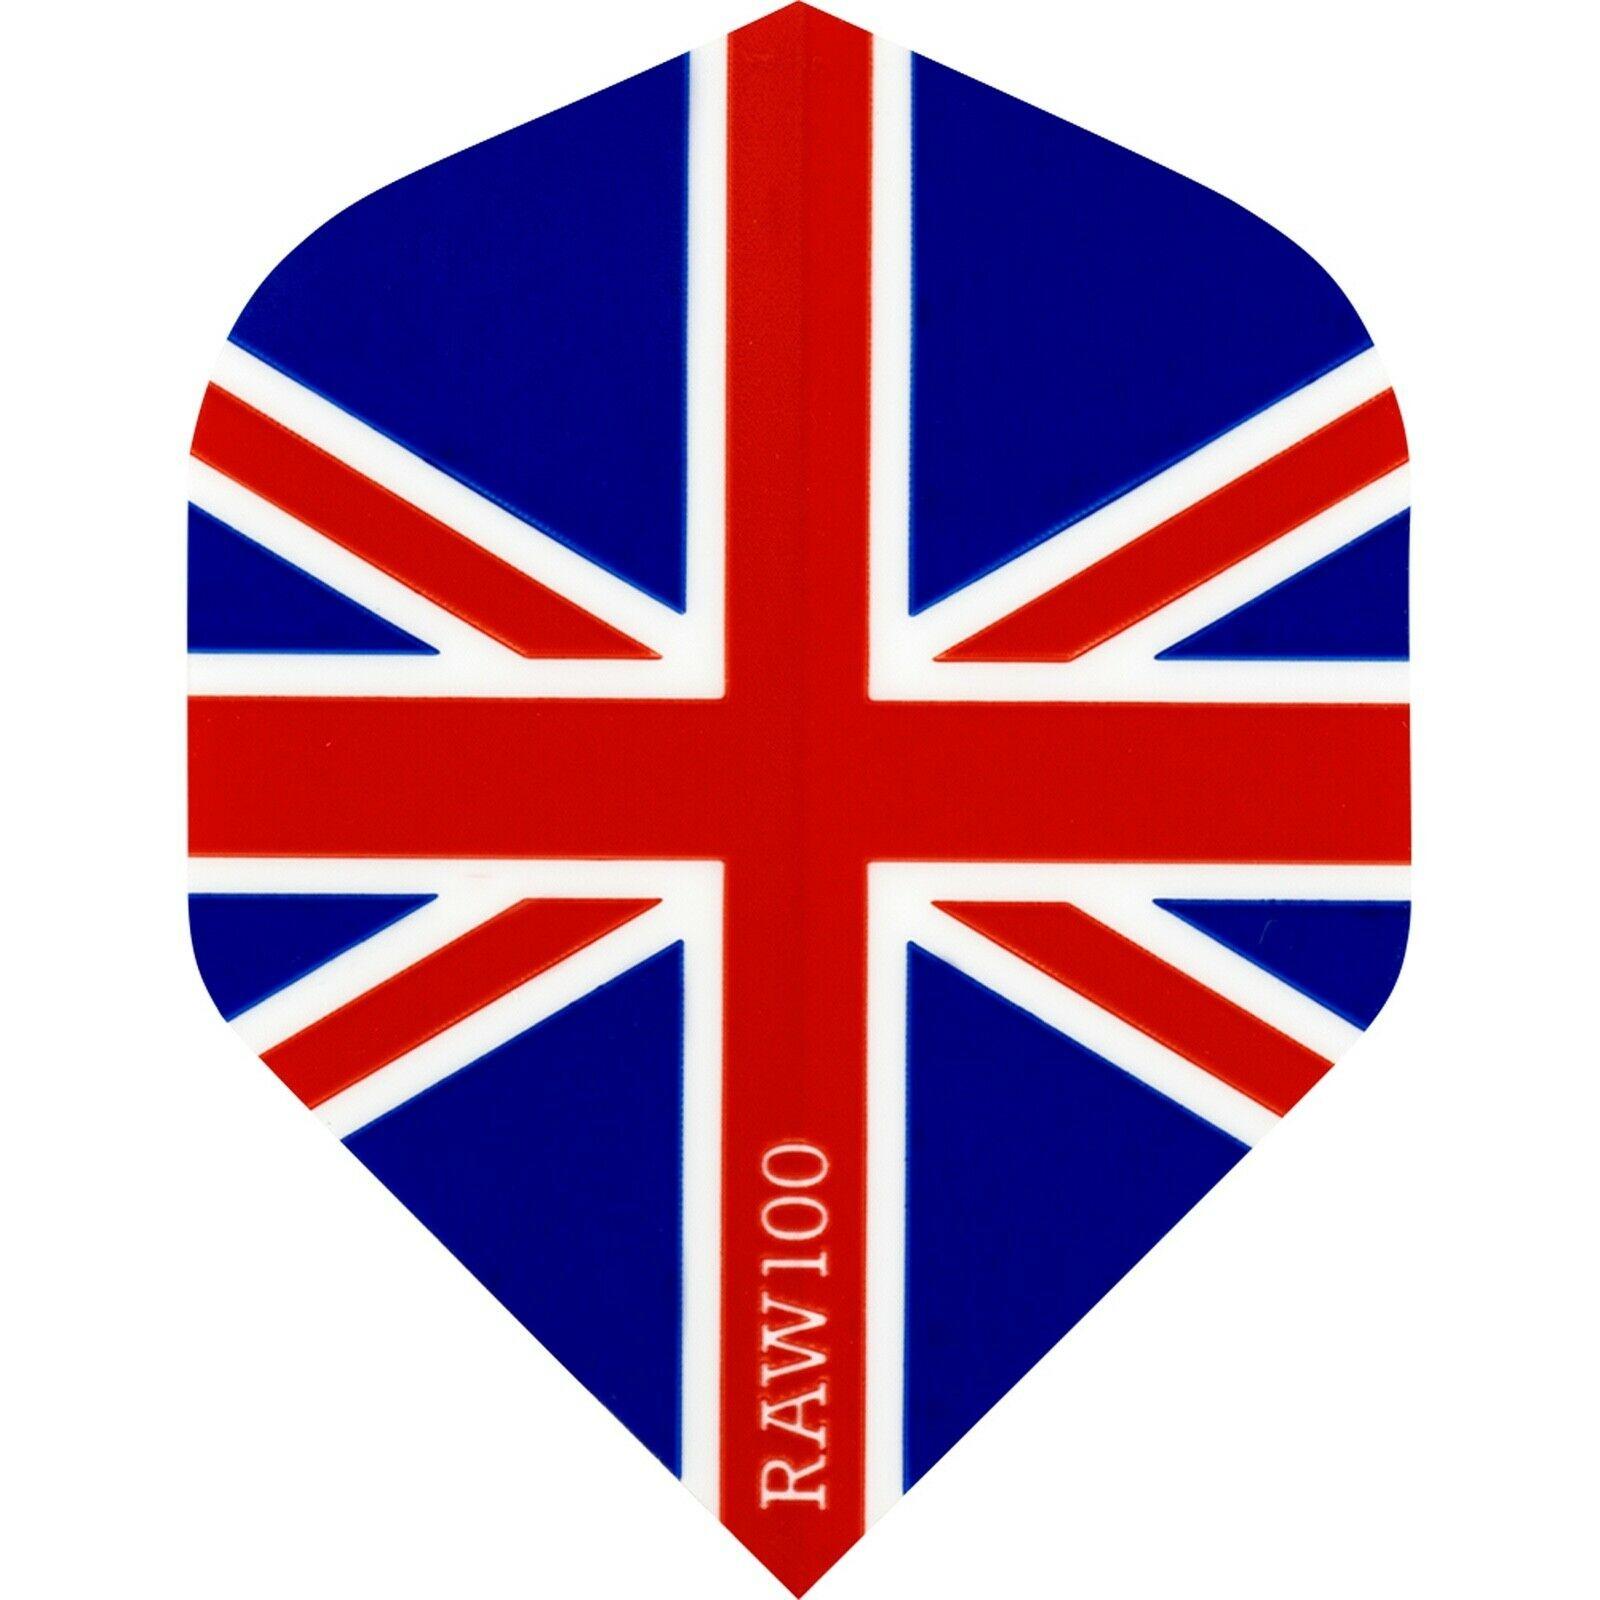 RAW 100 Union Jack Flight Red White & Blue